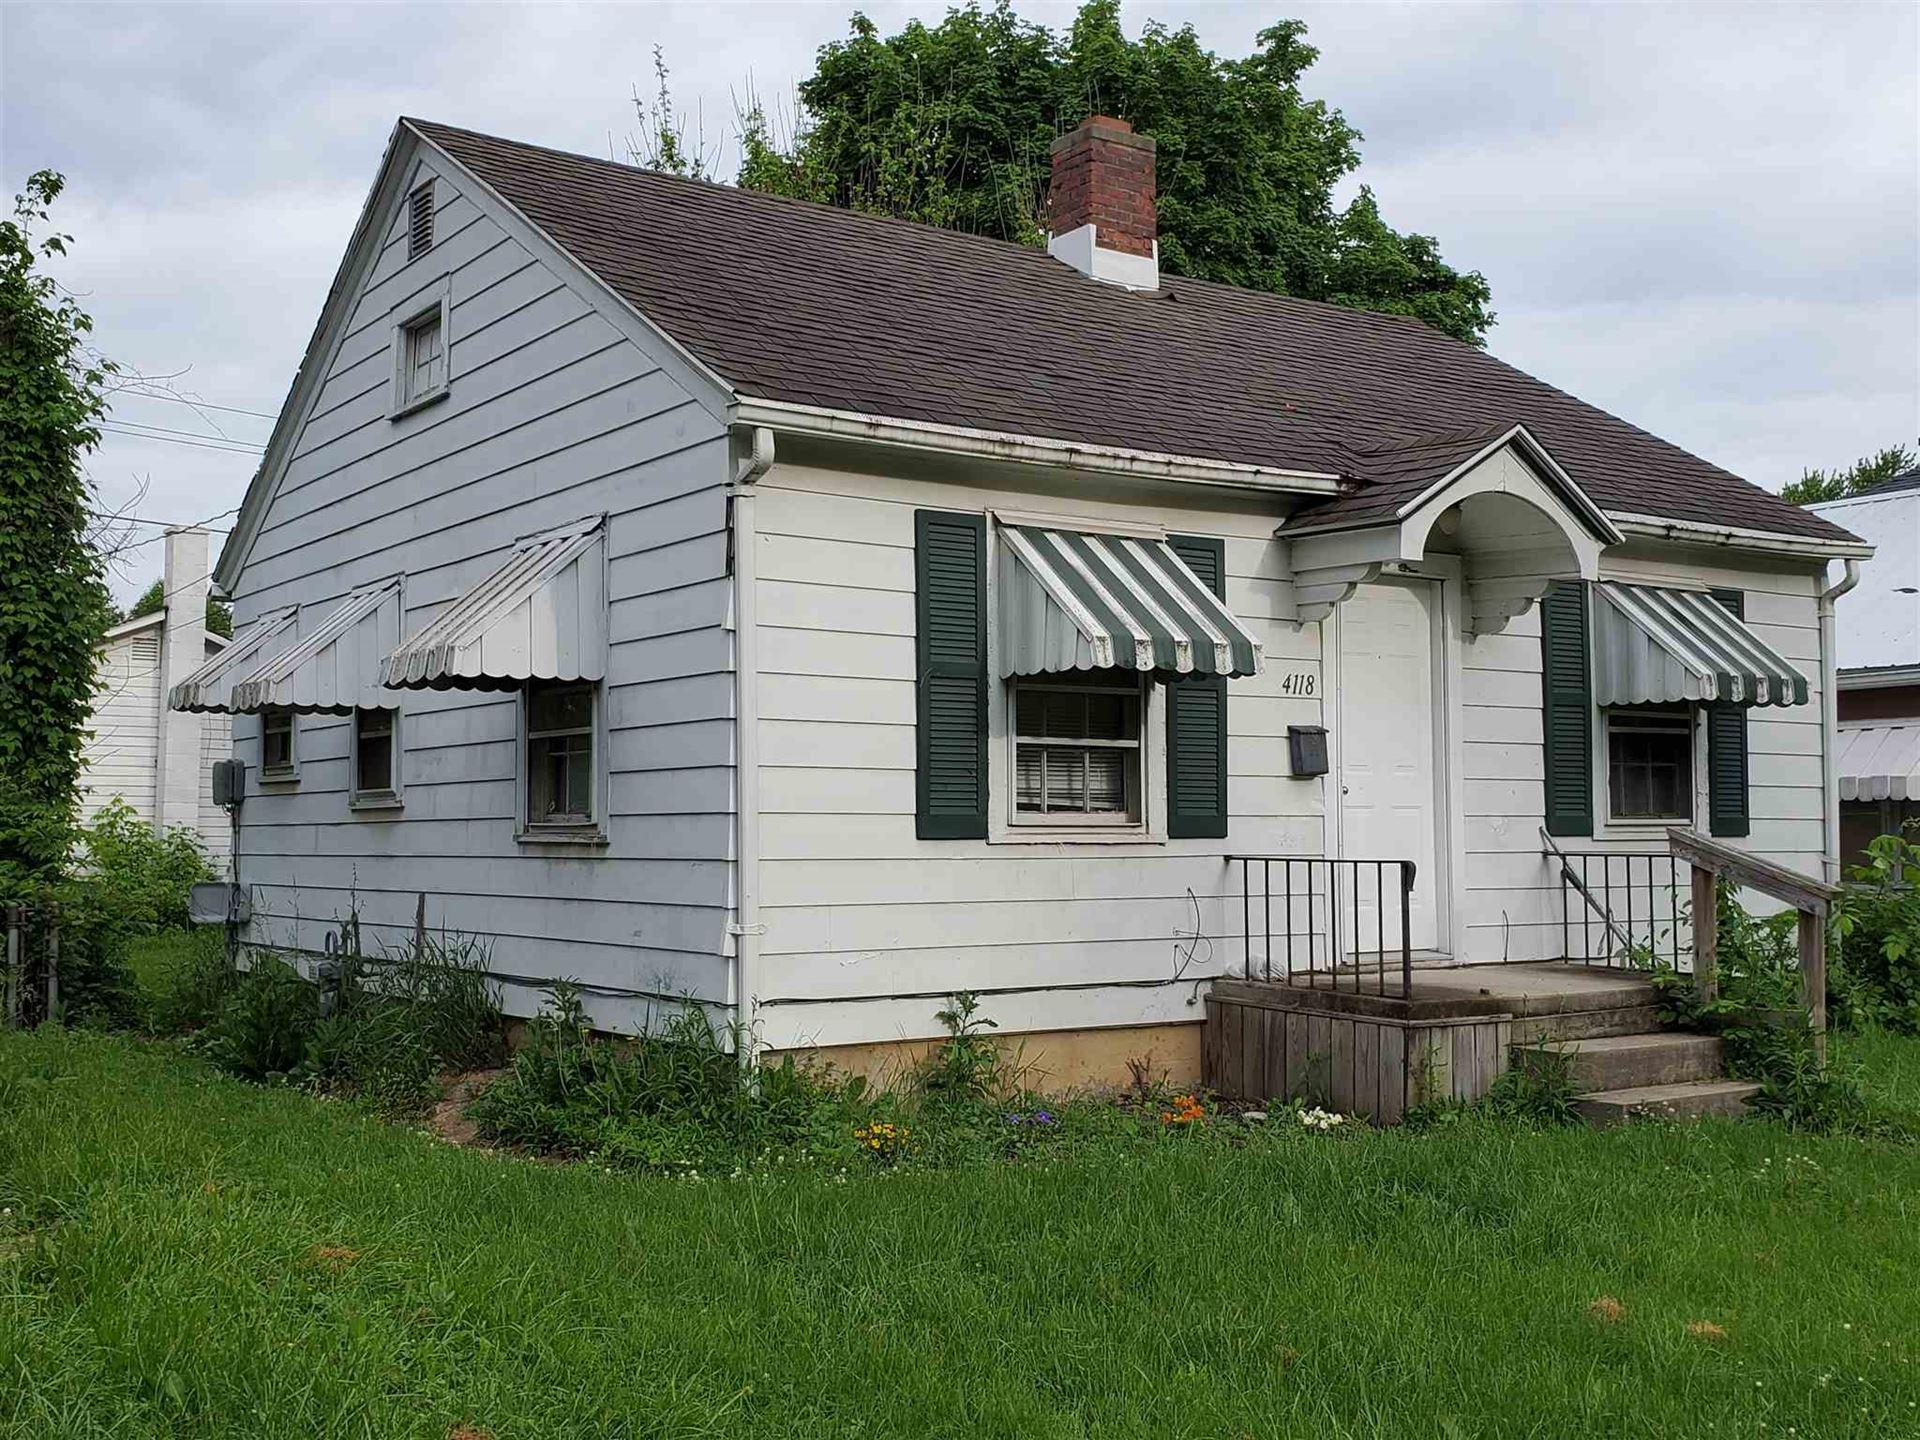 4118 Lillie Street, Fort Wayne, IN 46806 - #: 202022517